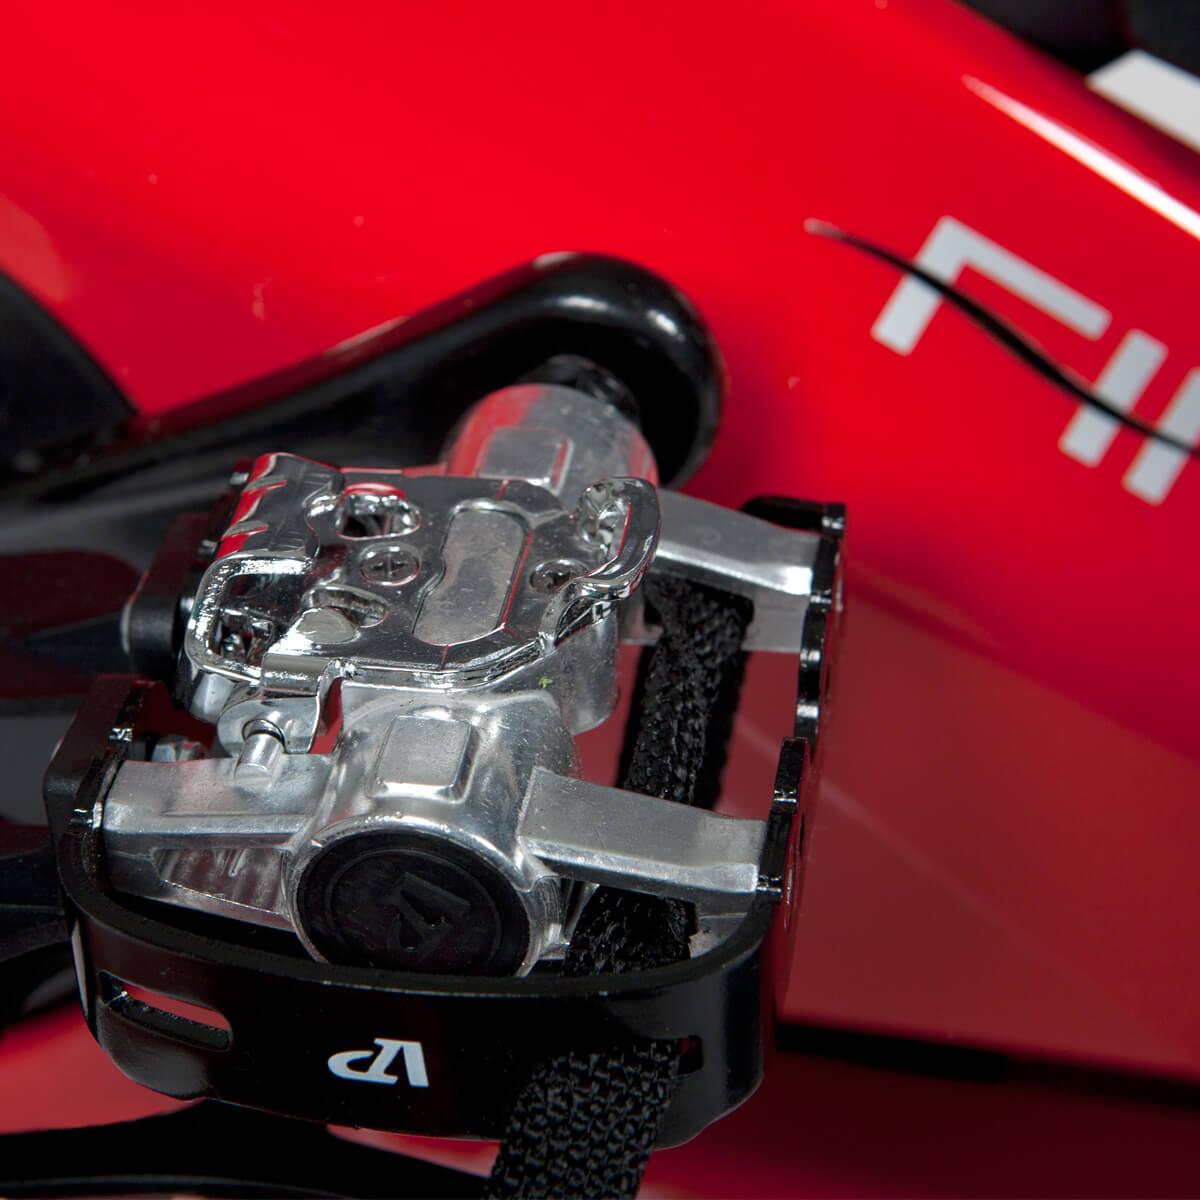 Finnlo Speedbike CRT spinning kerékpár - visszamondott - Gorillasport.hu